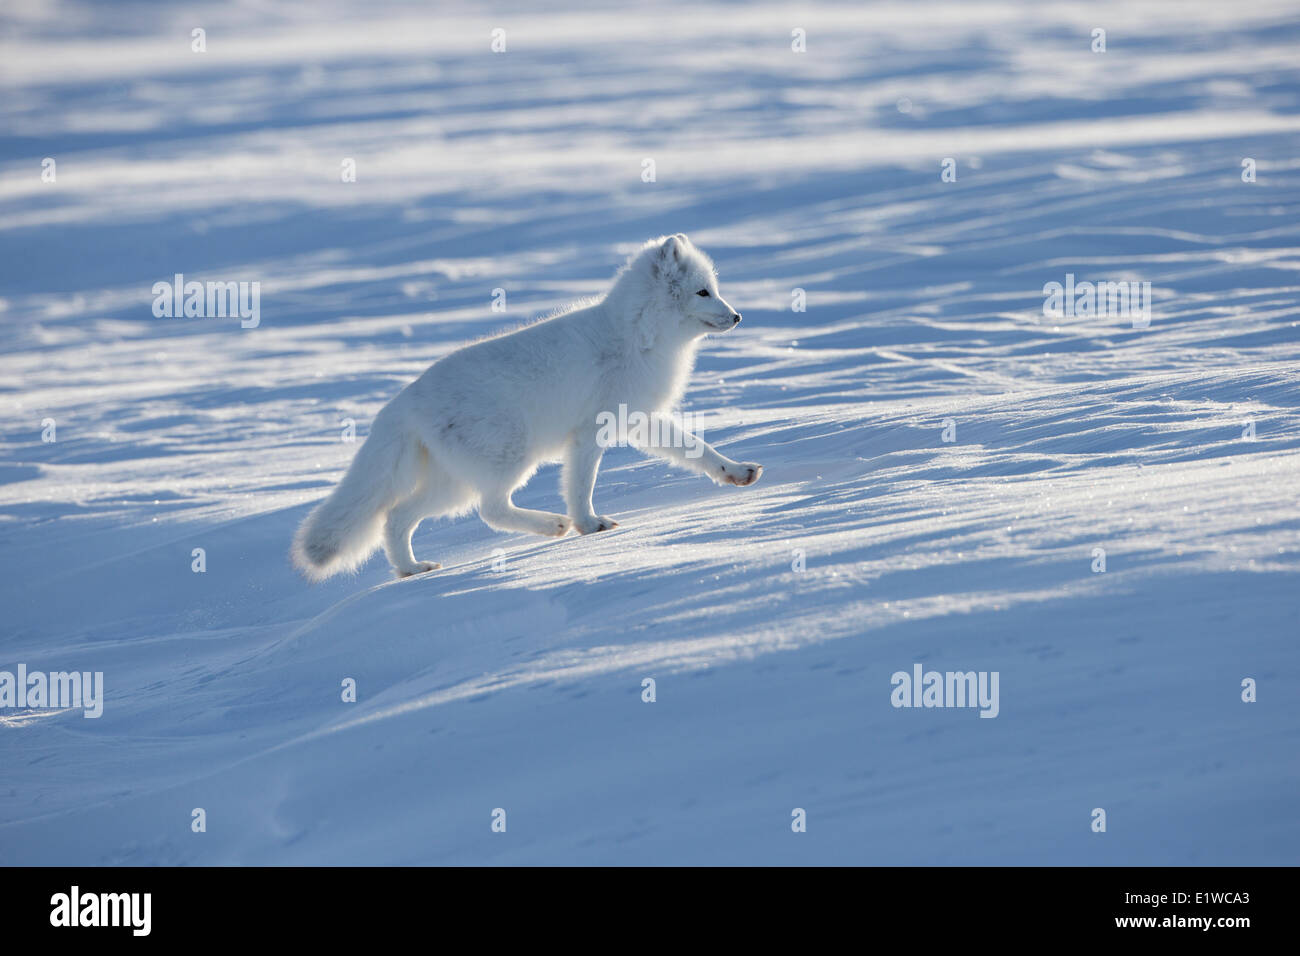 Arctic fox (Alopex lagopus), west coast Hudson Bay, south of Arviat, Nunavut, Canada - Stock Image